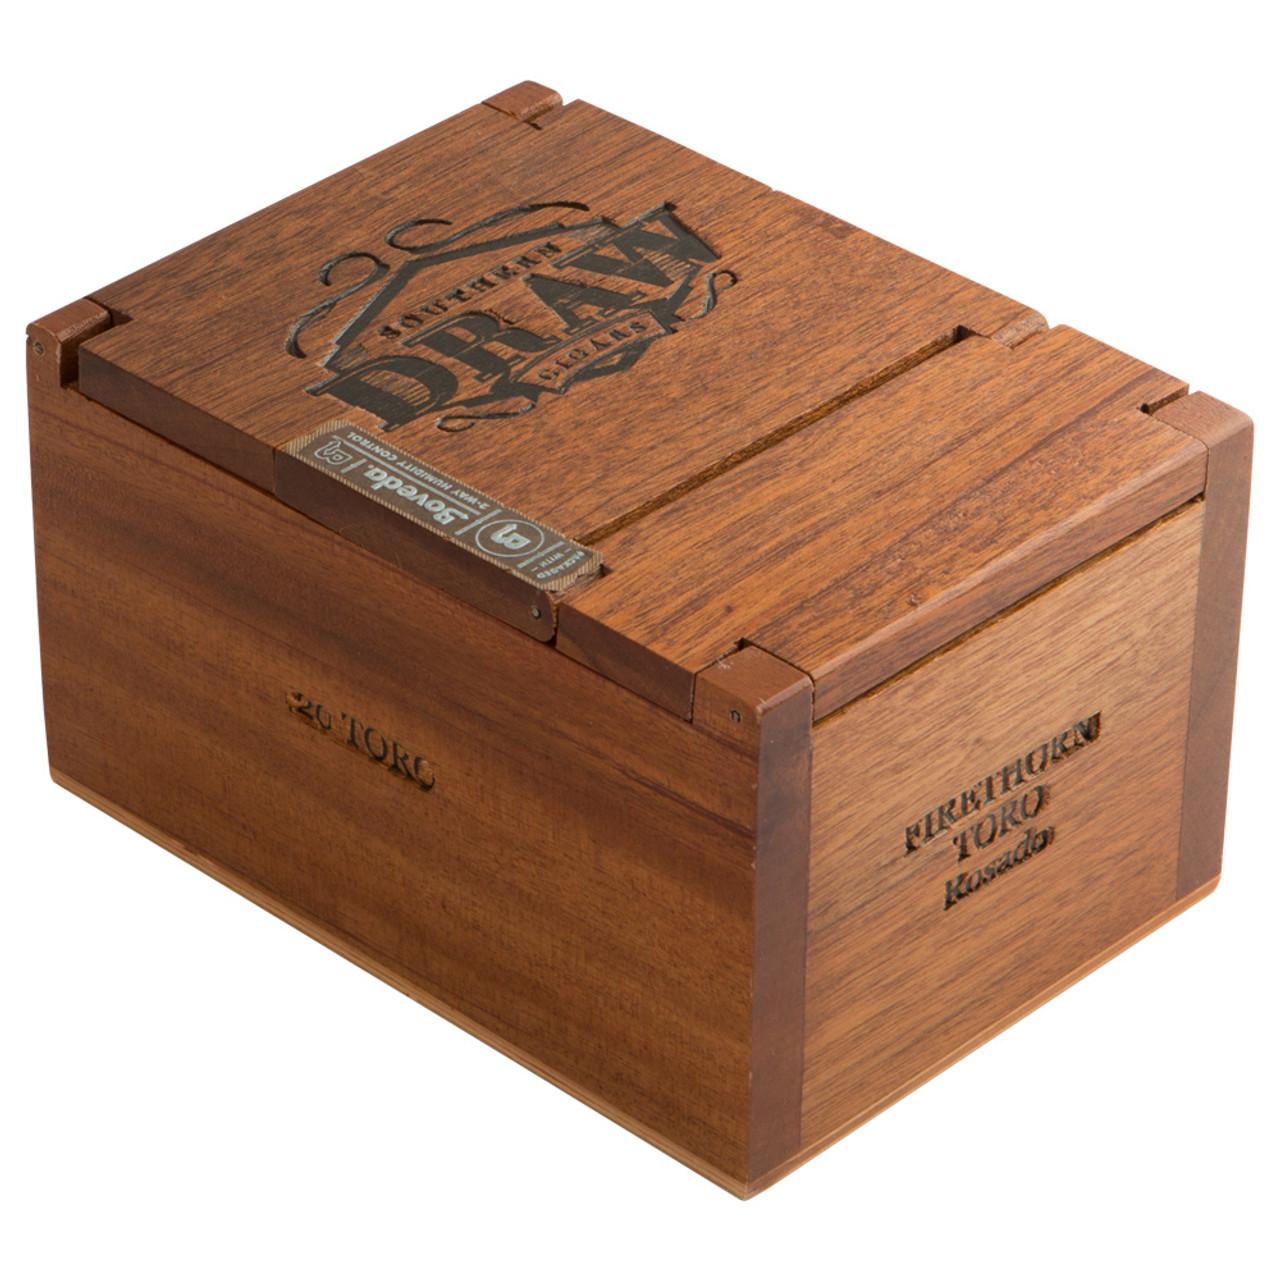 Southern Draw Firethorn Toro Cigars - 6 x 52 (Box of 20)